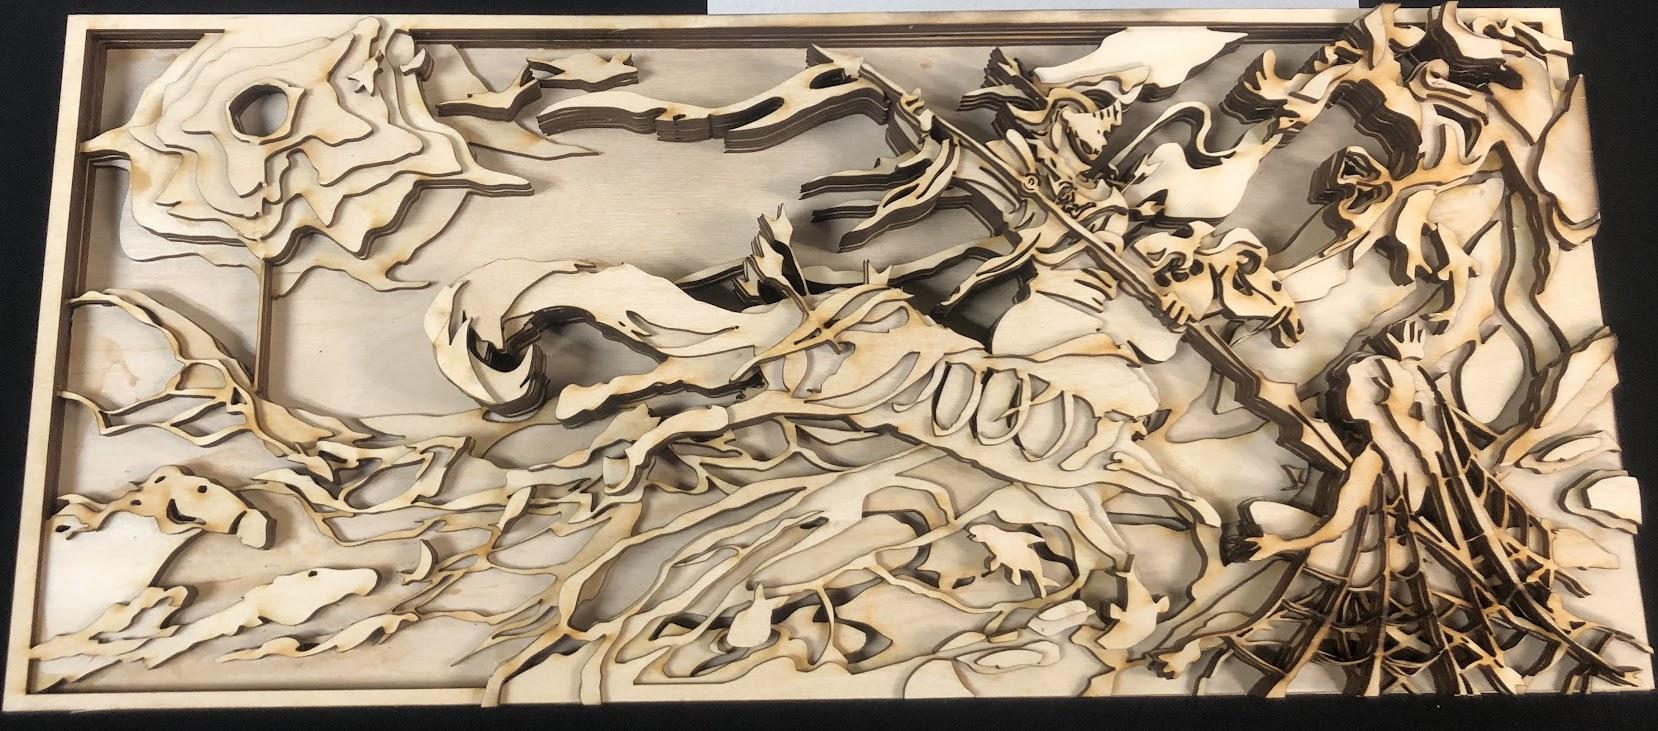 Layered Laser Cut Wood Art